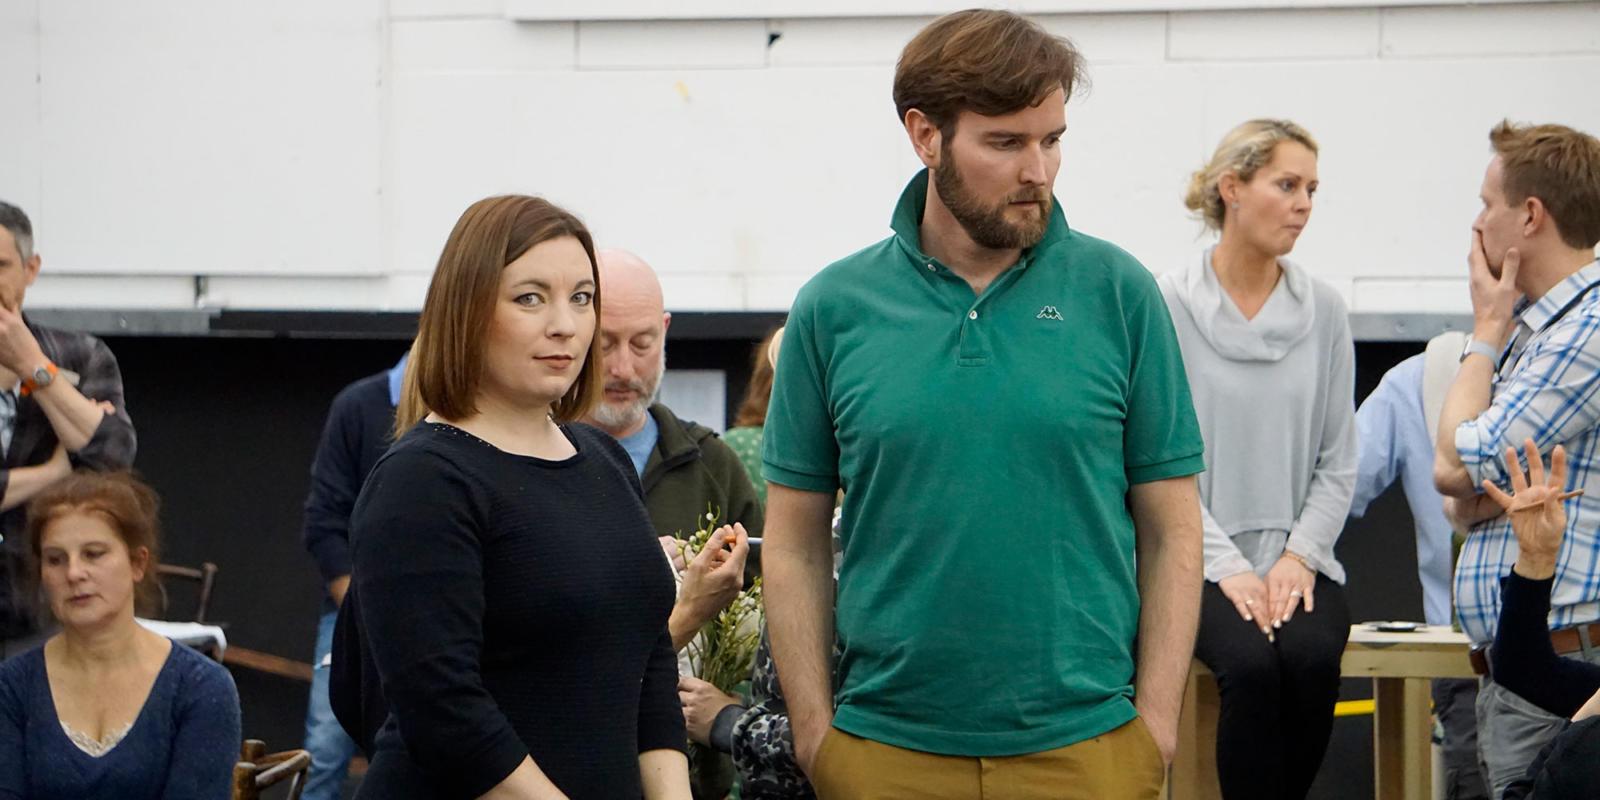 ENO La bohème rehearsals: Natalya Romaniw who sings Mimi and Nicholas Lester who sings Marcello